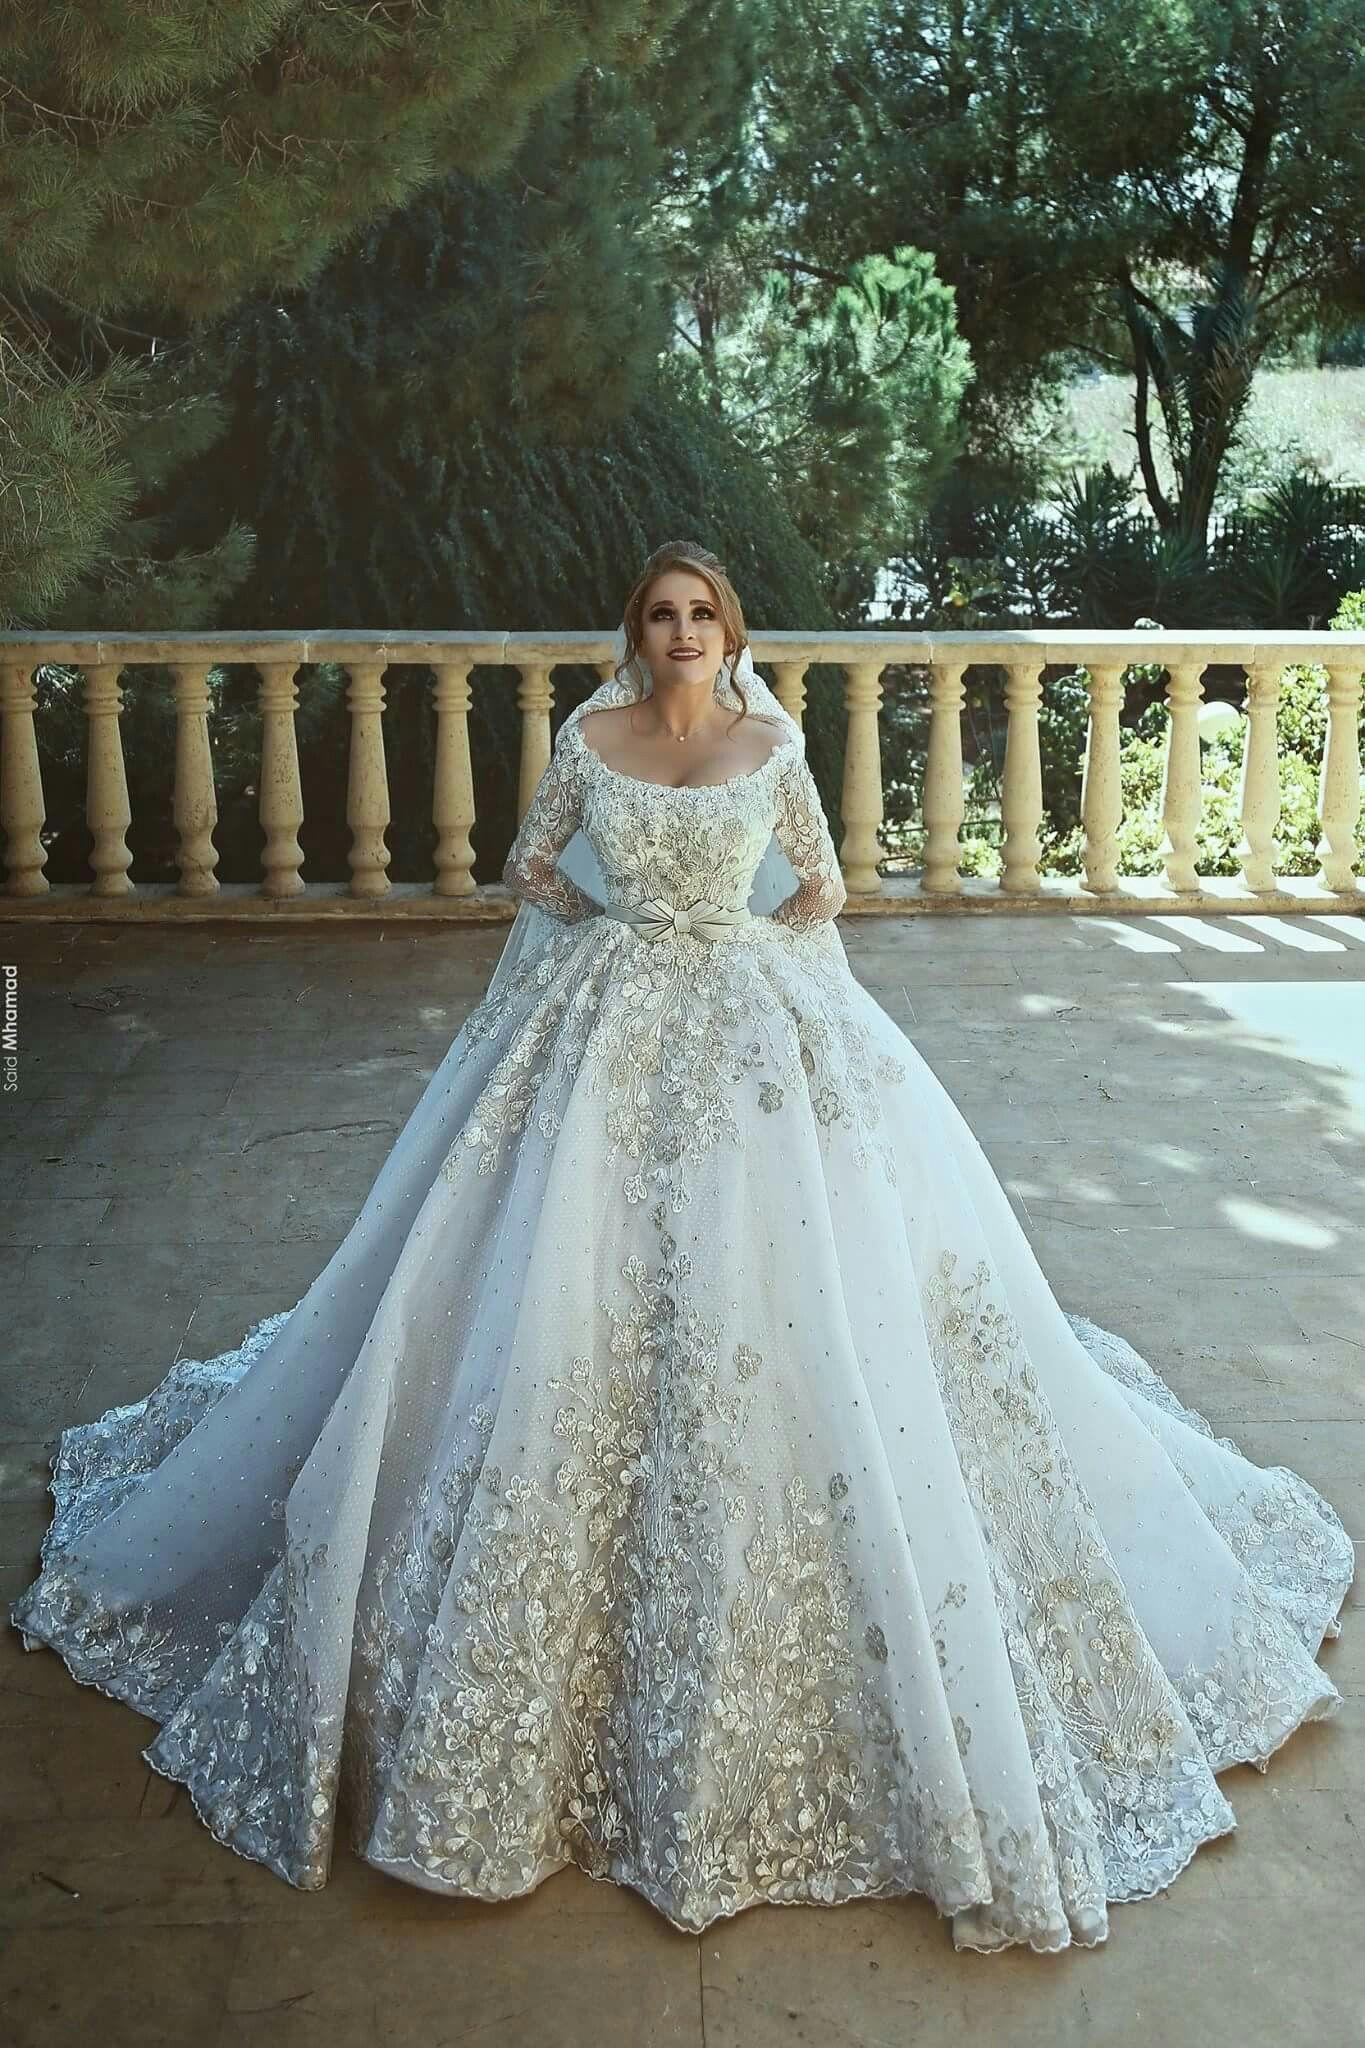 Pin de Roca Rocío en Wedding Dresses ❤ | Pinterest | Vestidos de ...